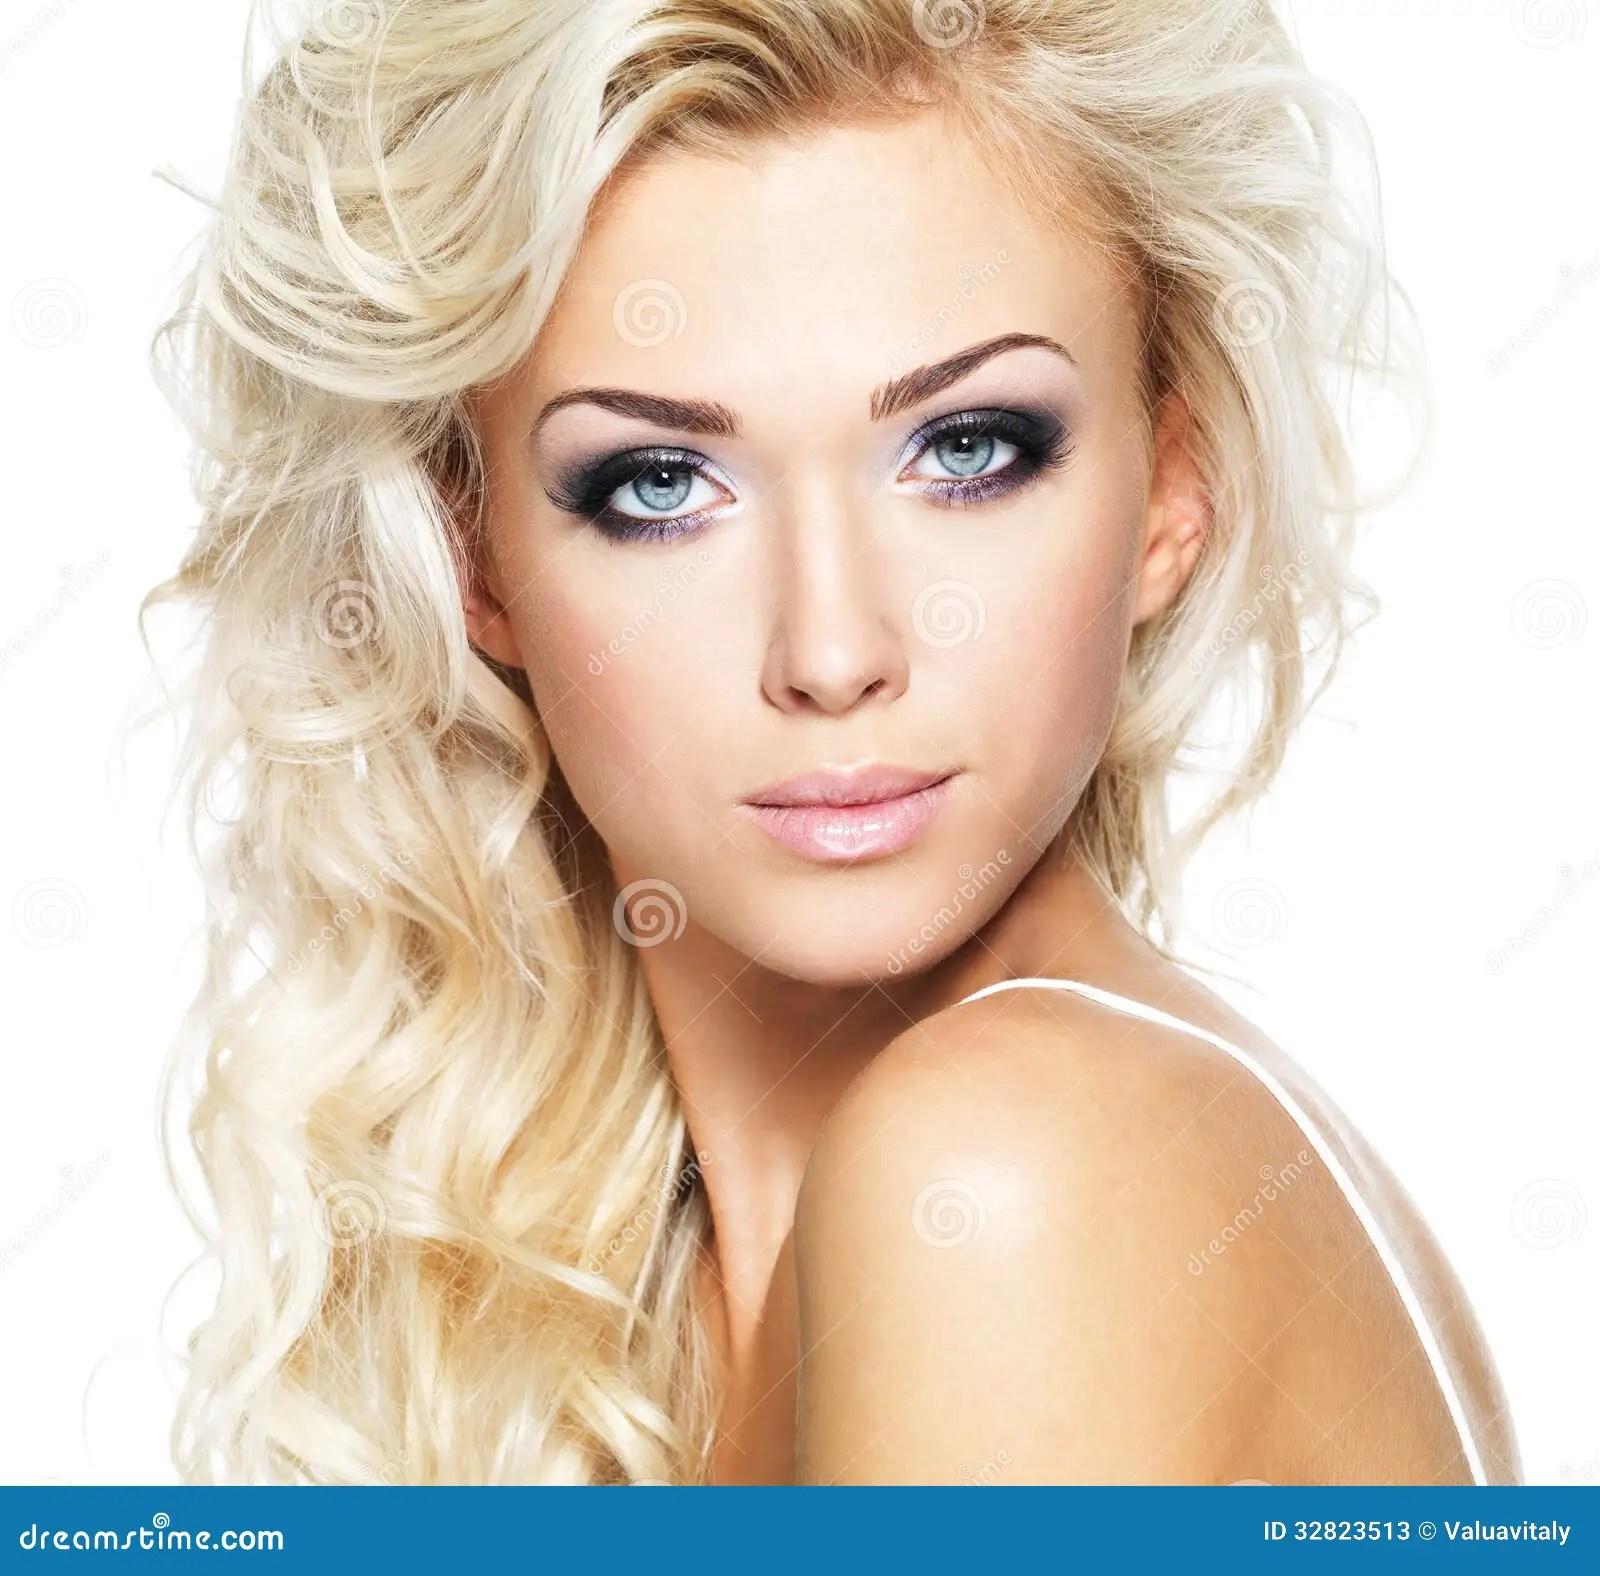 Business Frisuren Frauen Lange Haare Undercut Locken Frisur Ideen